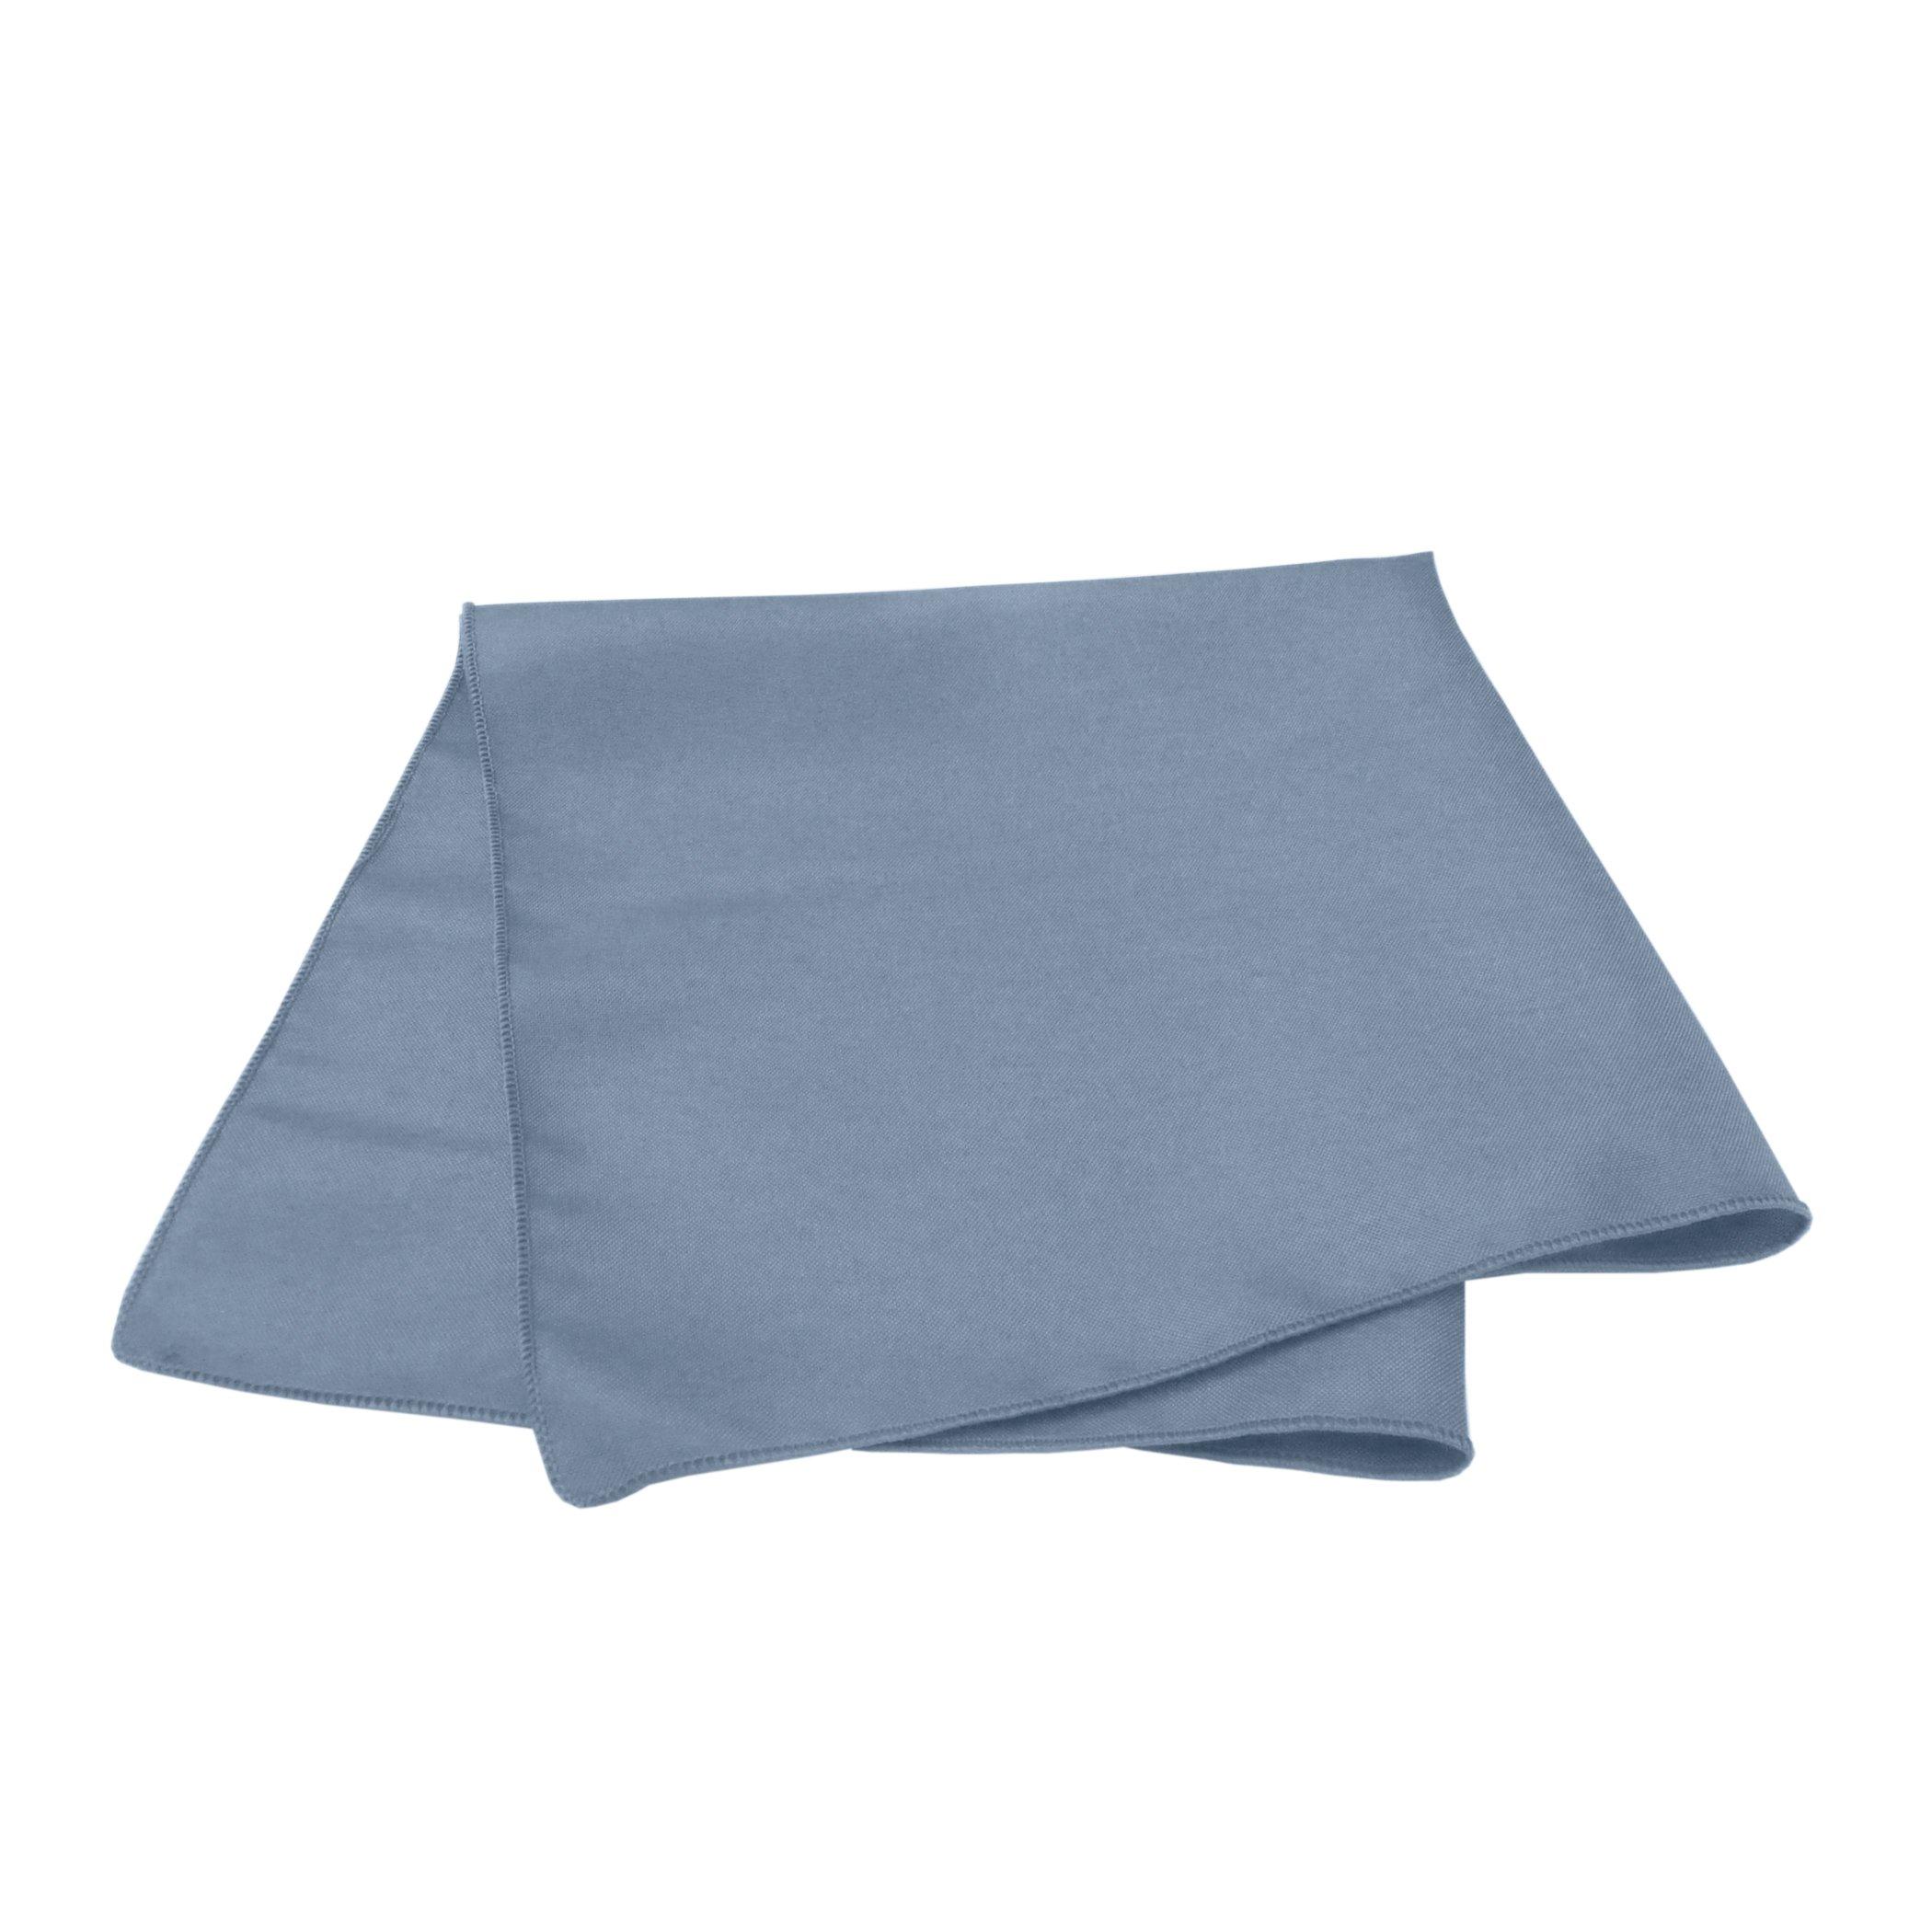 Ultimate Textile -10 Dozen- 10 x 10-Inch Cloth Cocktail Napkins, Slate Blue